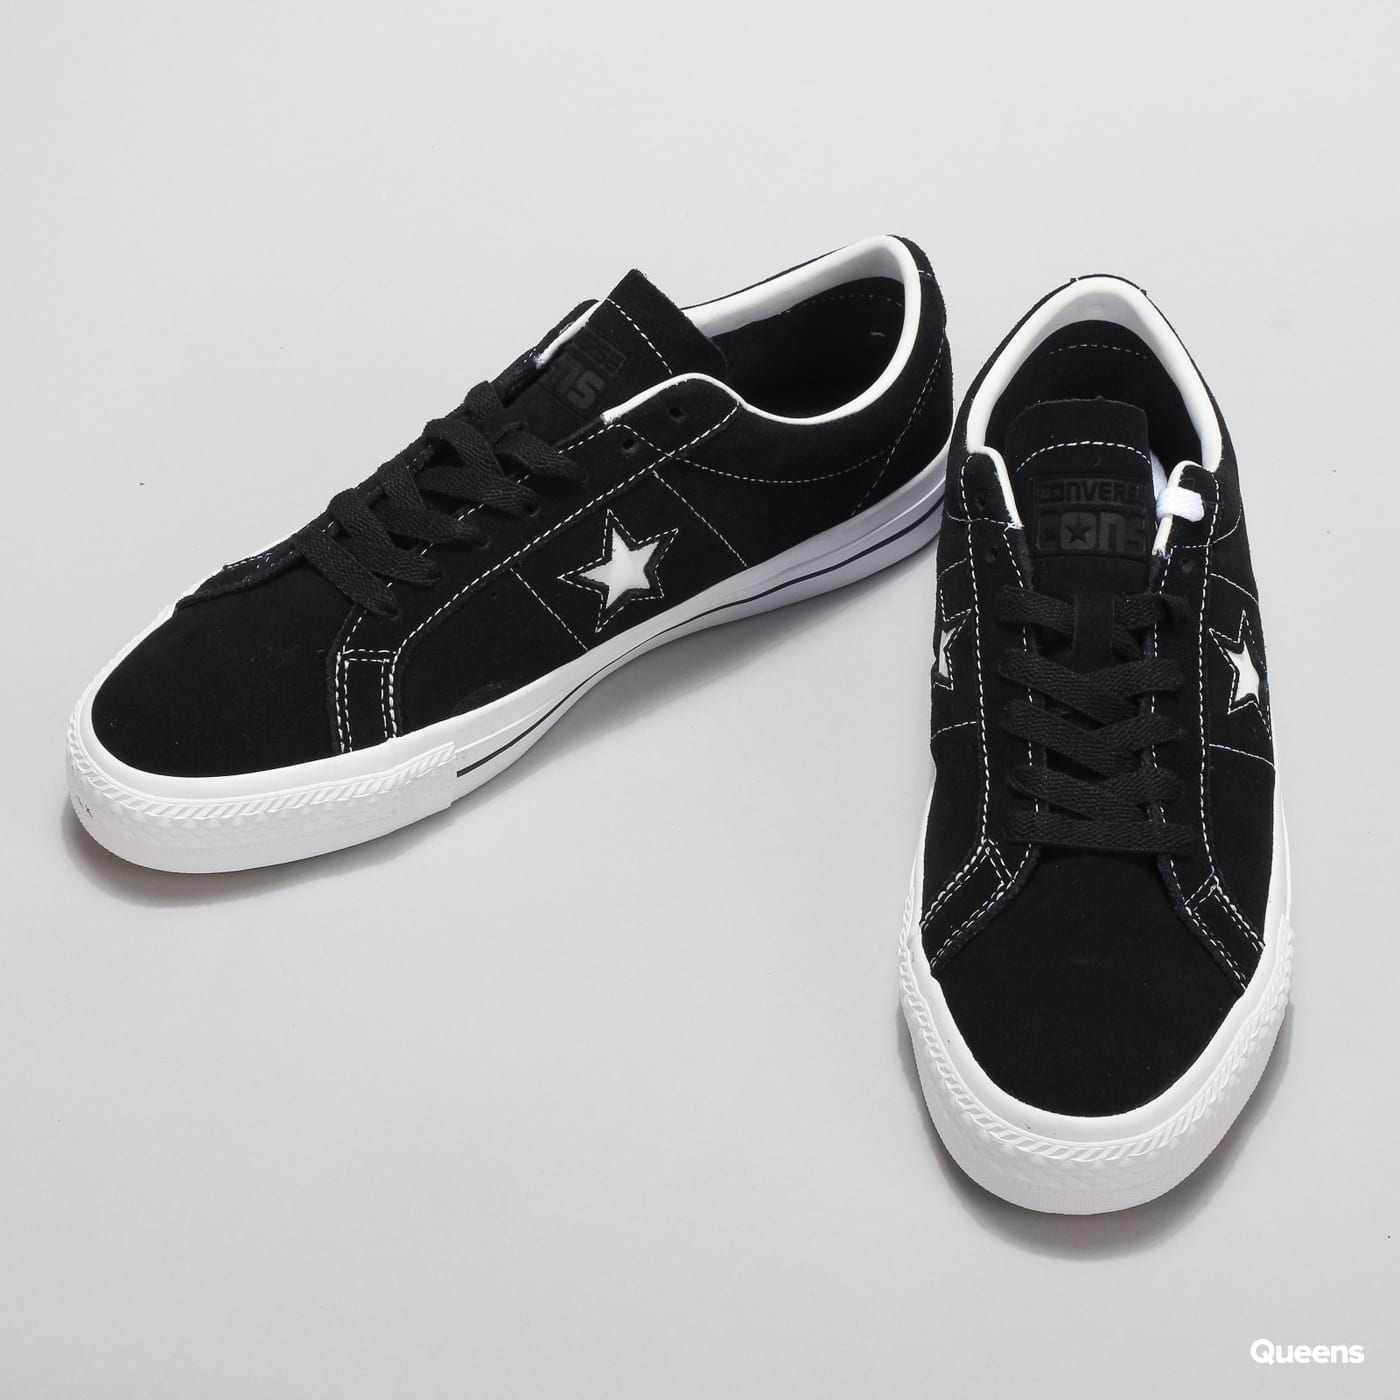 Converse One Star Pro OX black / white / white